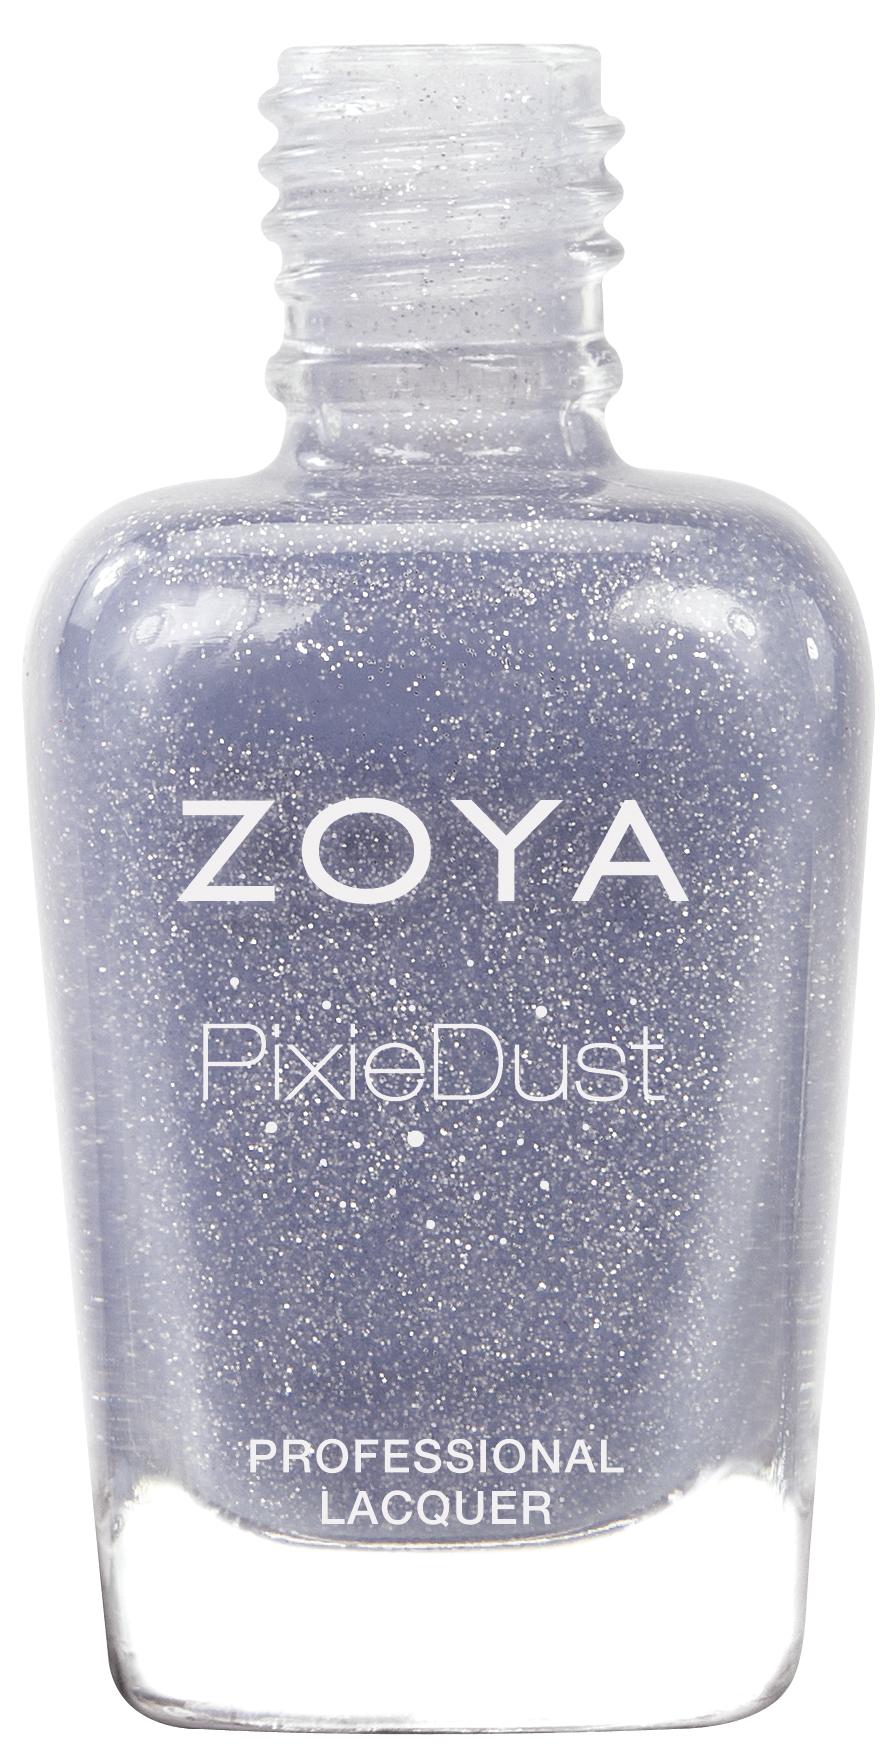 Nyx product impression